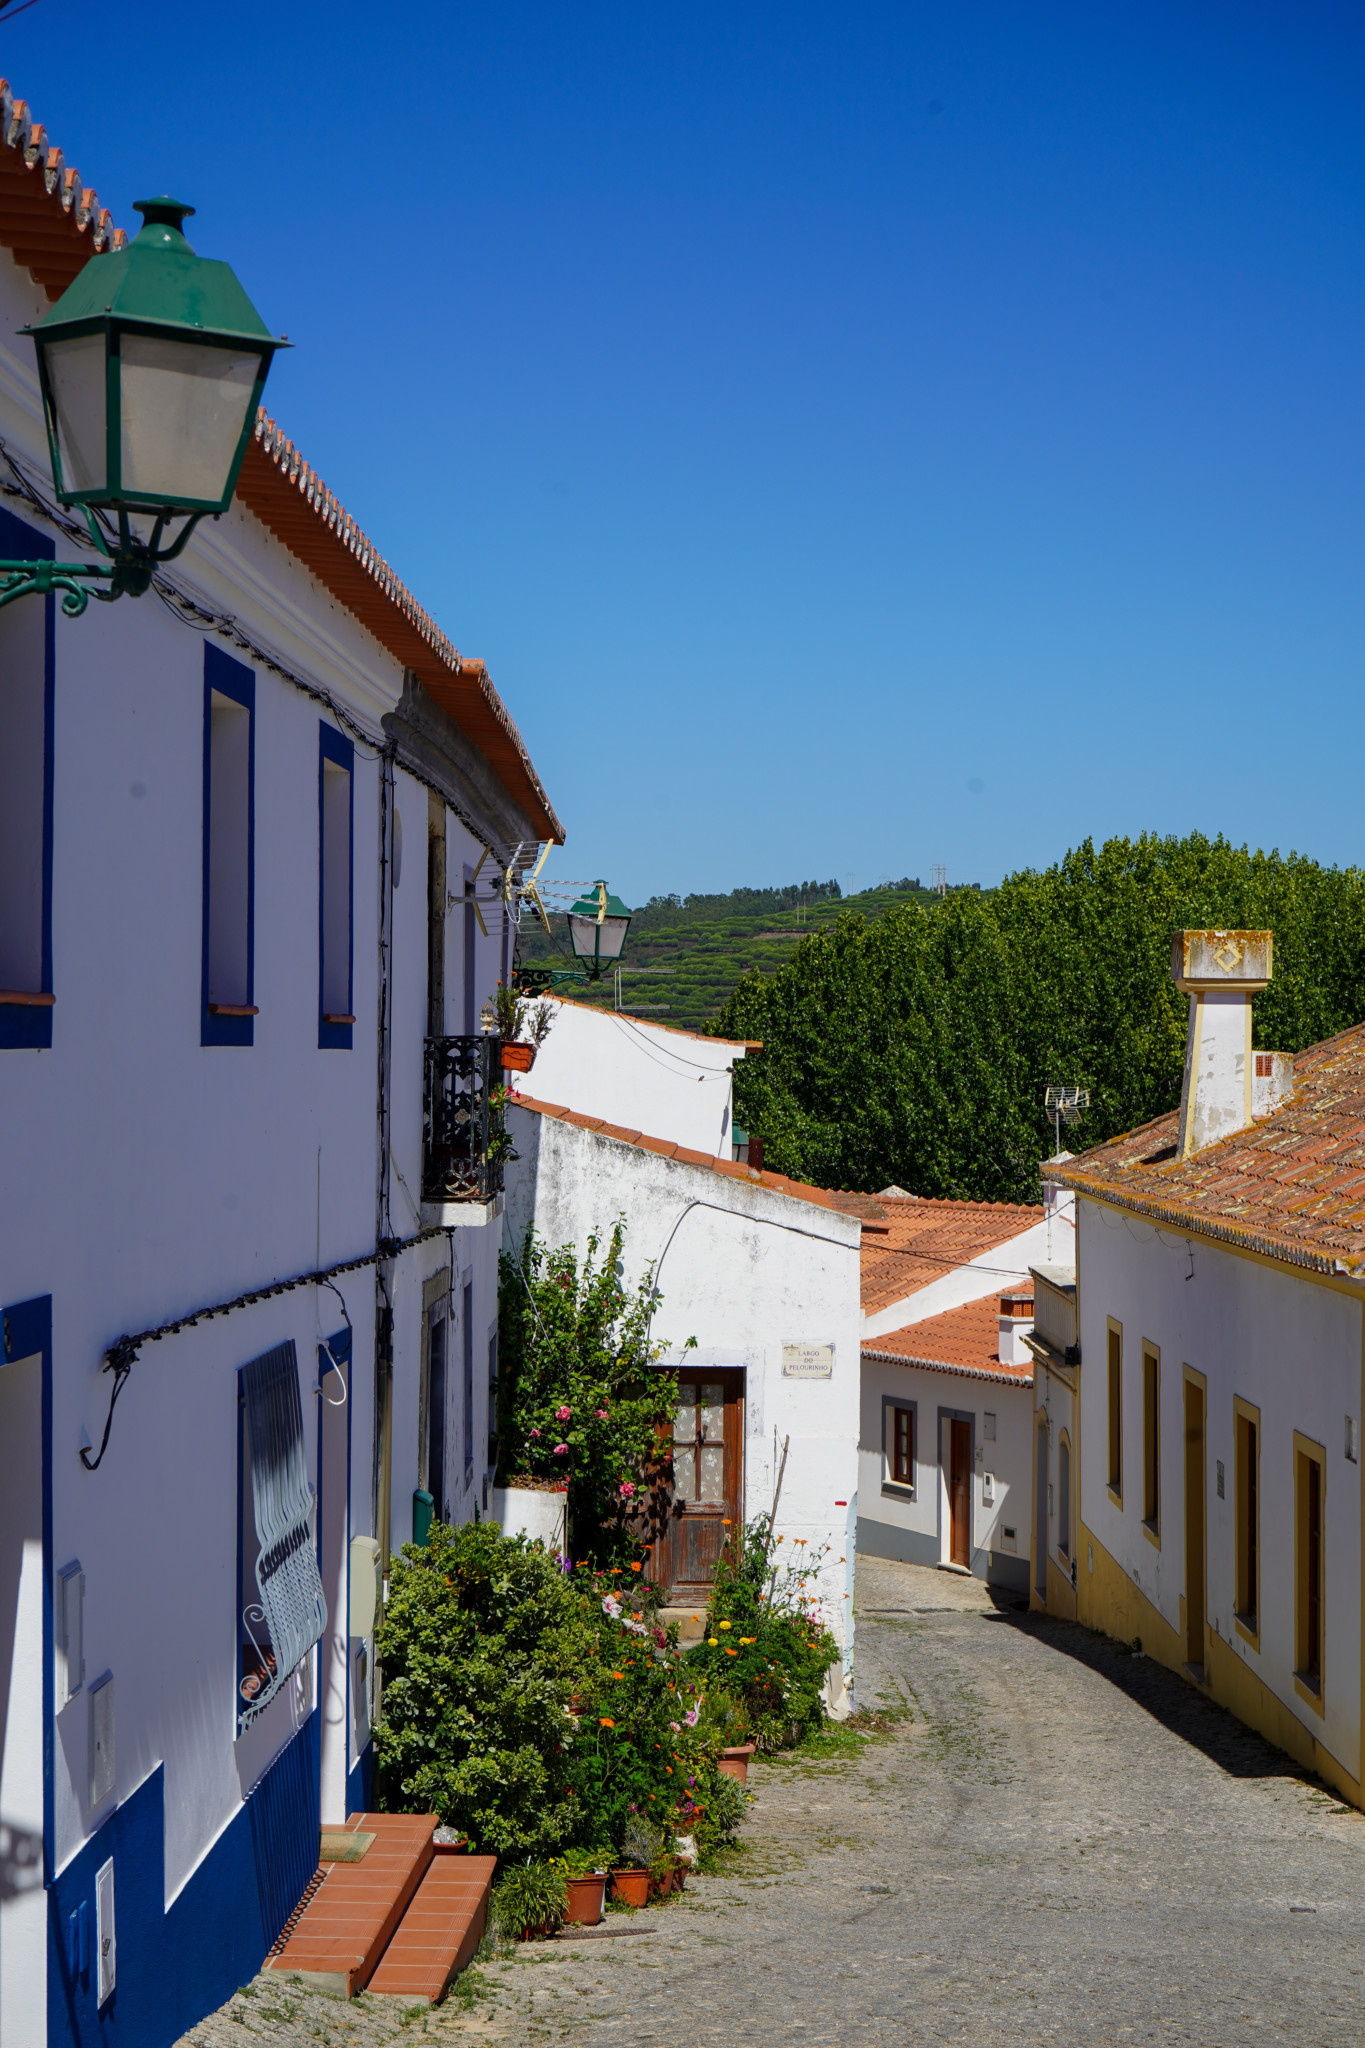 Weg zum Castelo do Aljezur